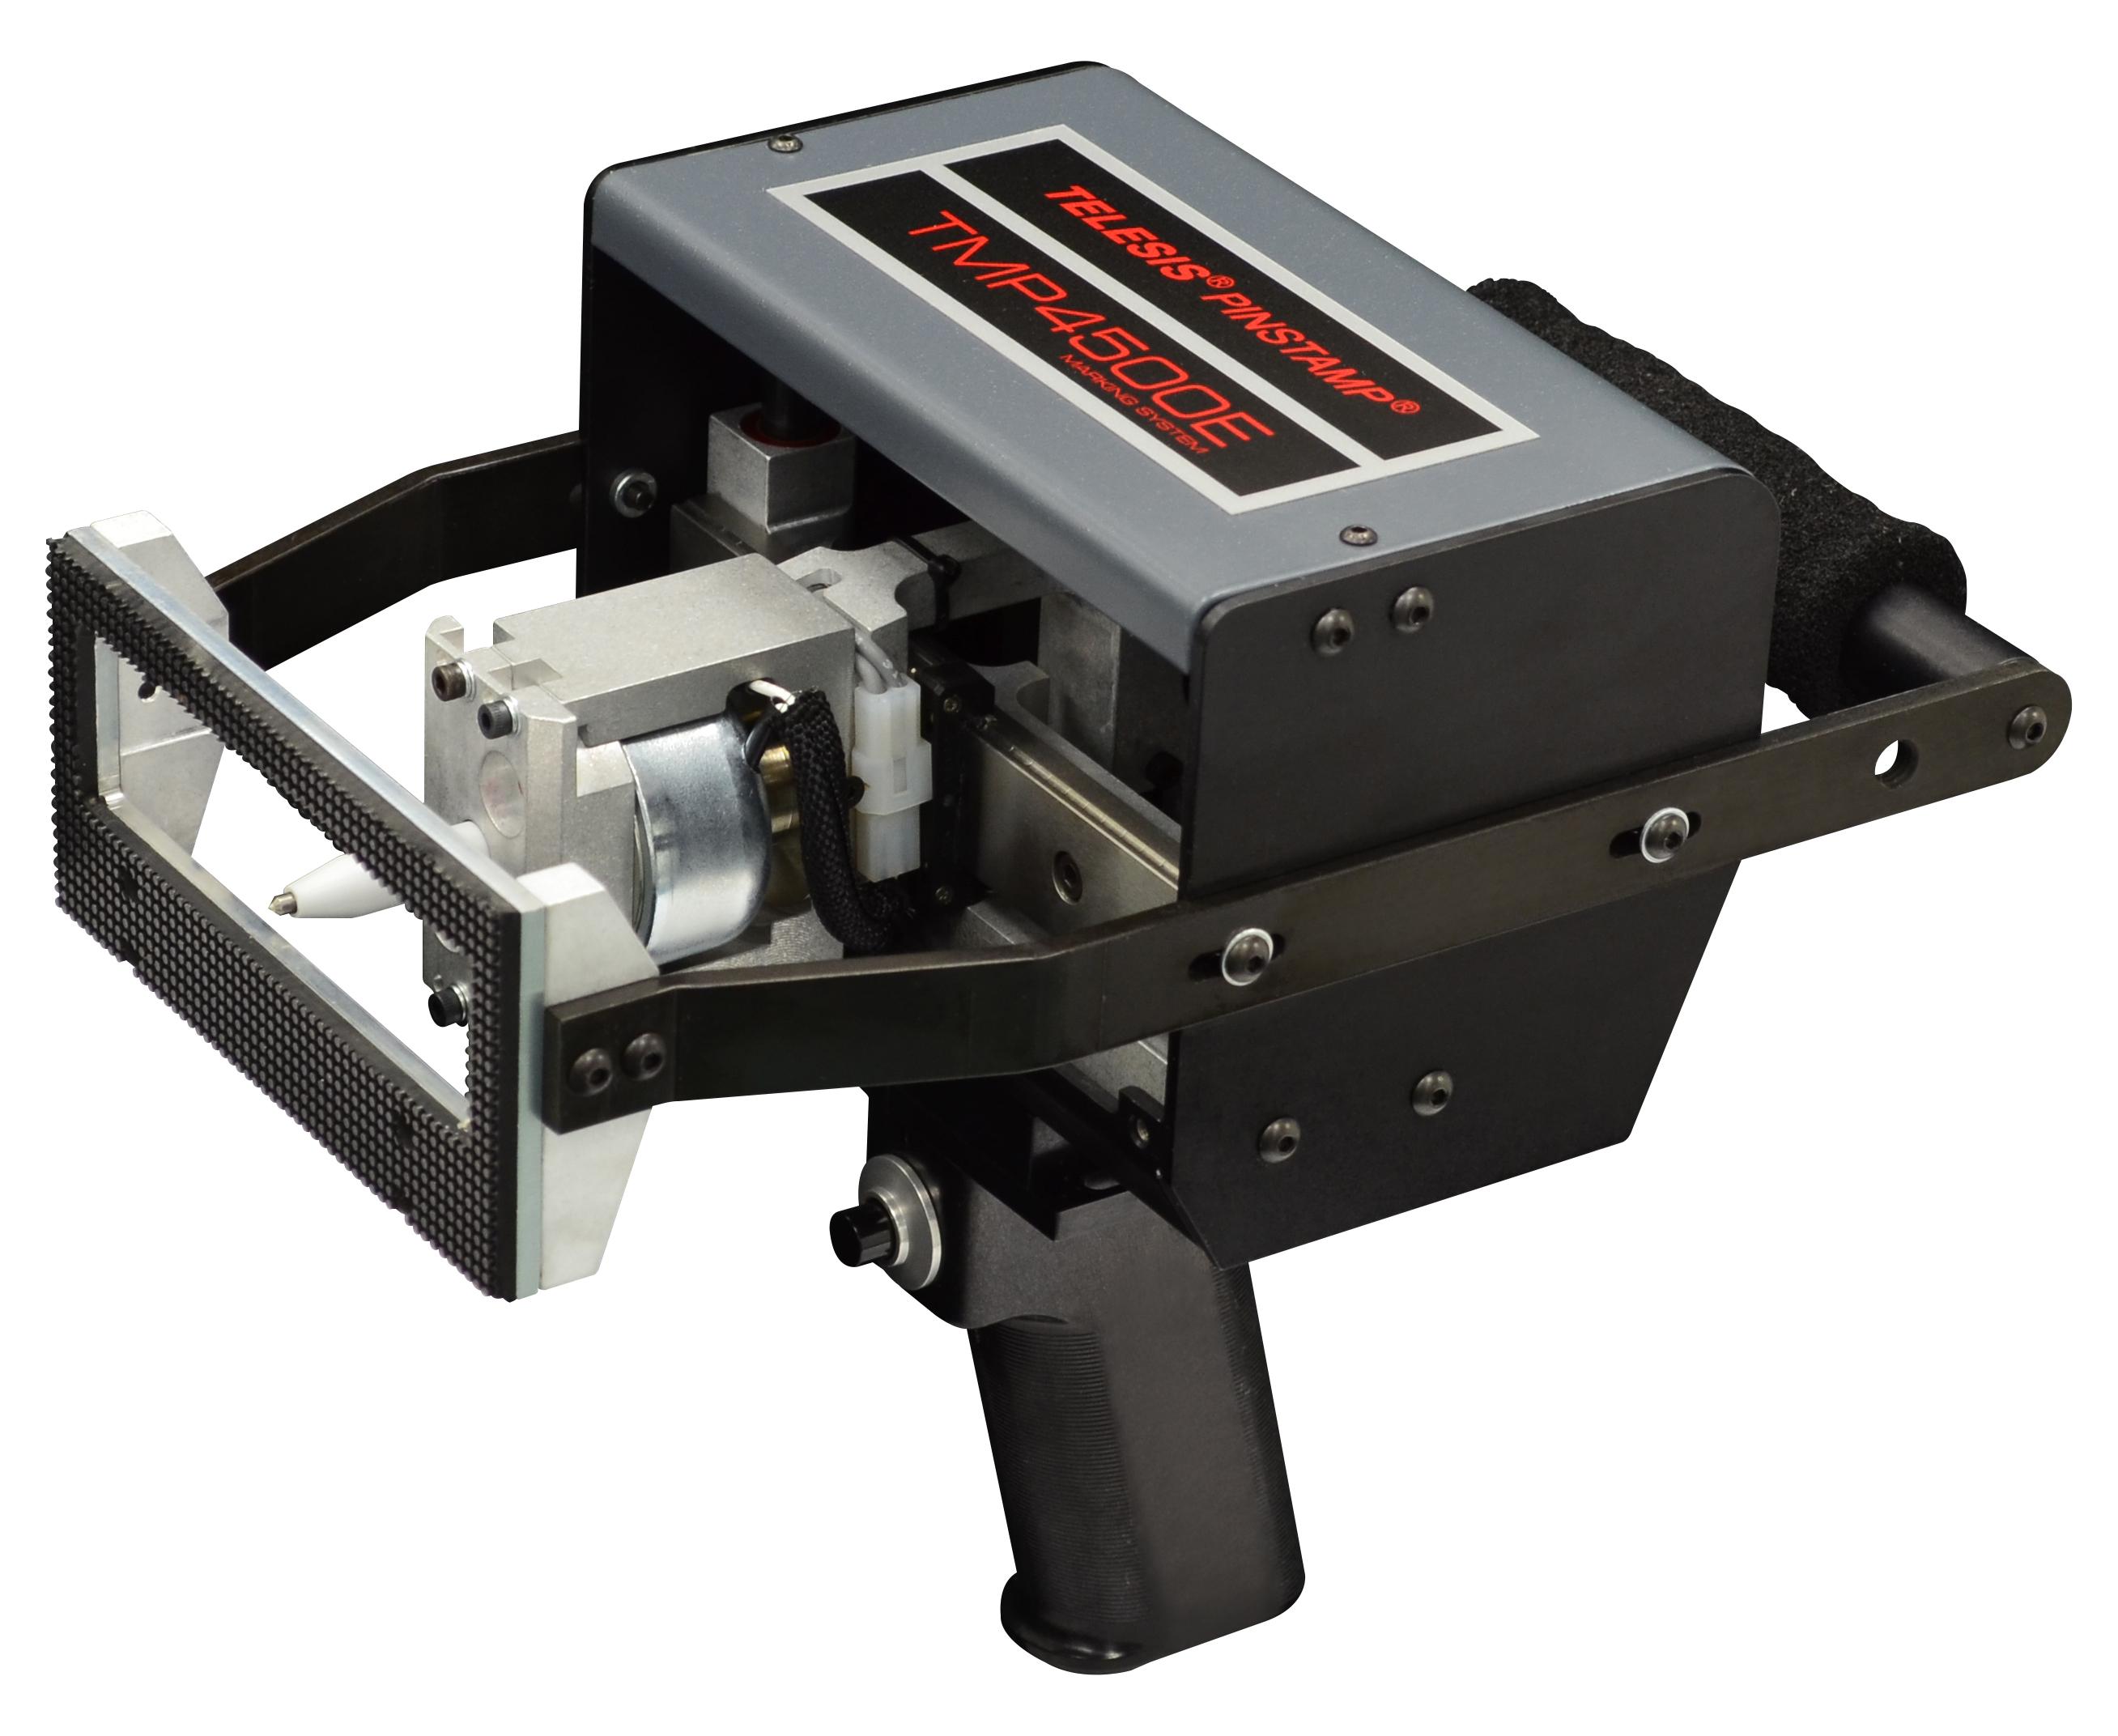 Micropercusión Telesis Pinstamp 4500